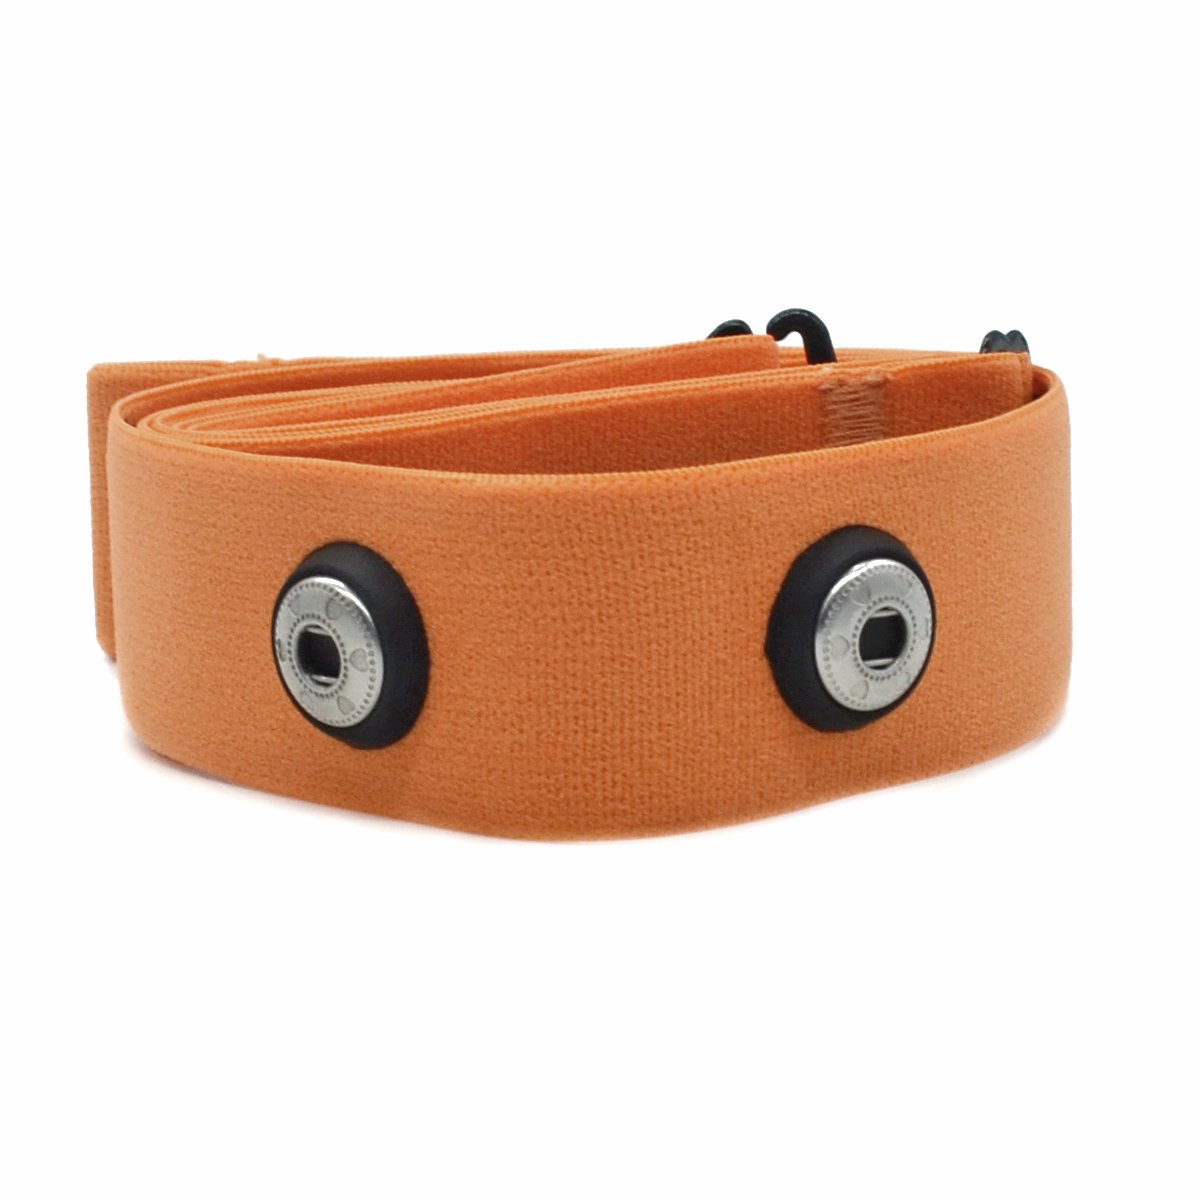 Cinghia per cardiofrequenzimetro Garmin, Wahoo e Polar, regolabile, da posizionare sul petto, ideale per sport e fitness, CooSpo Original HRM Belt Orange product image